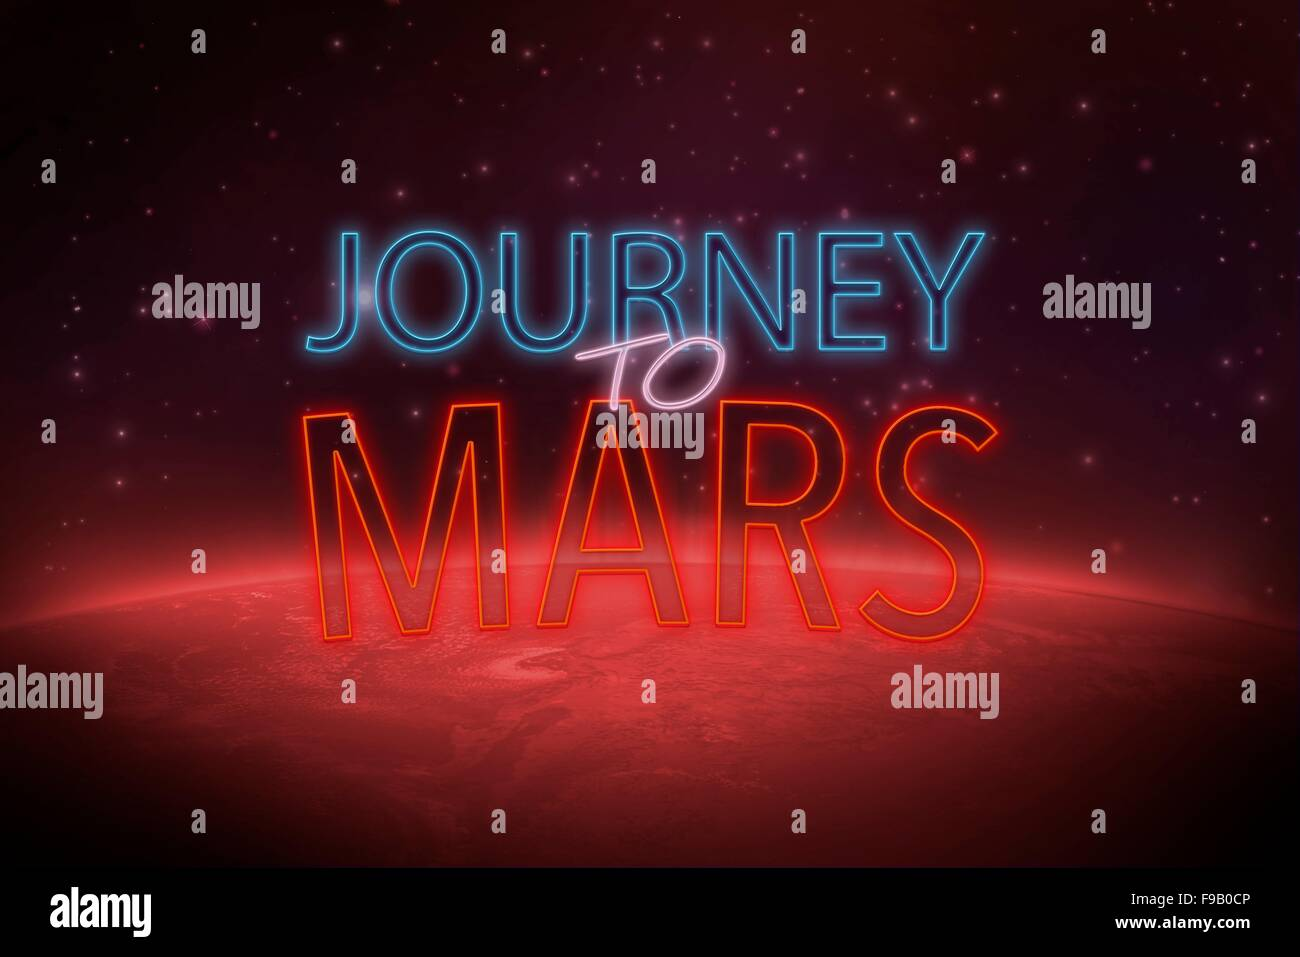 interplanetary journey to mars (space exploration) - Stock Image